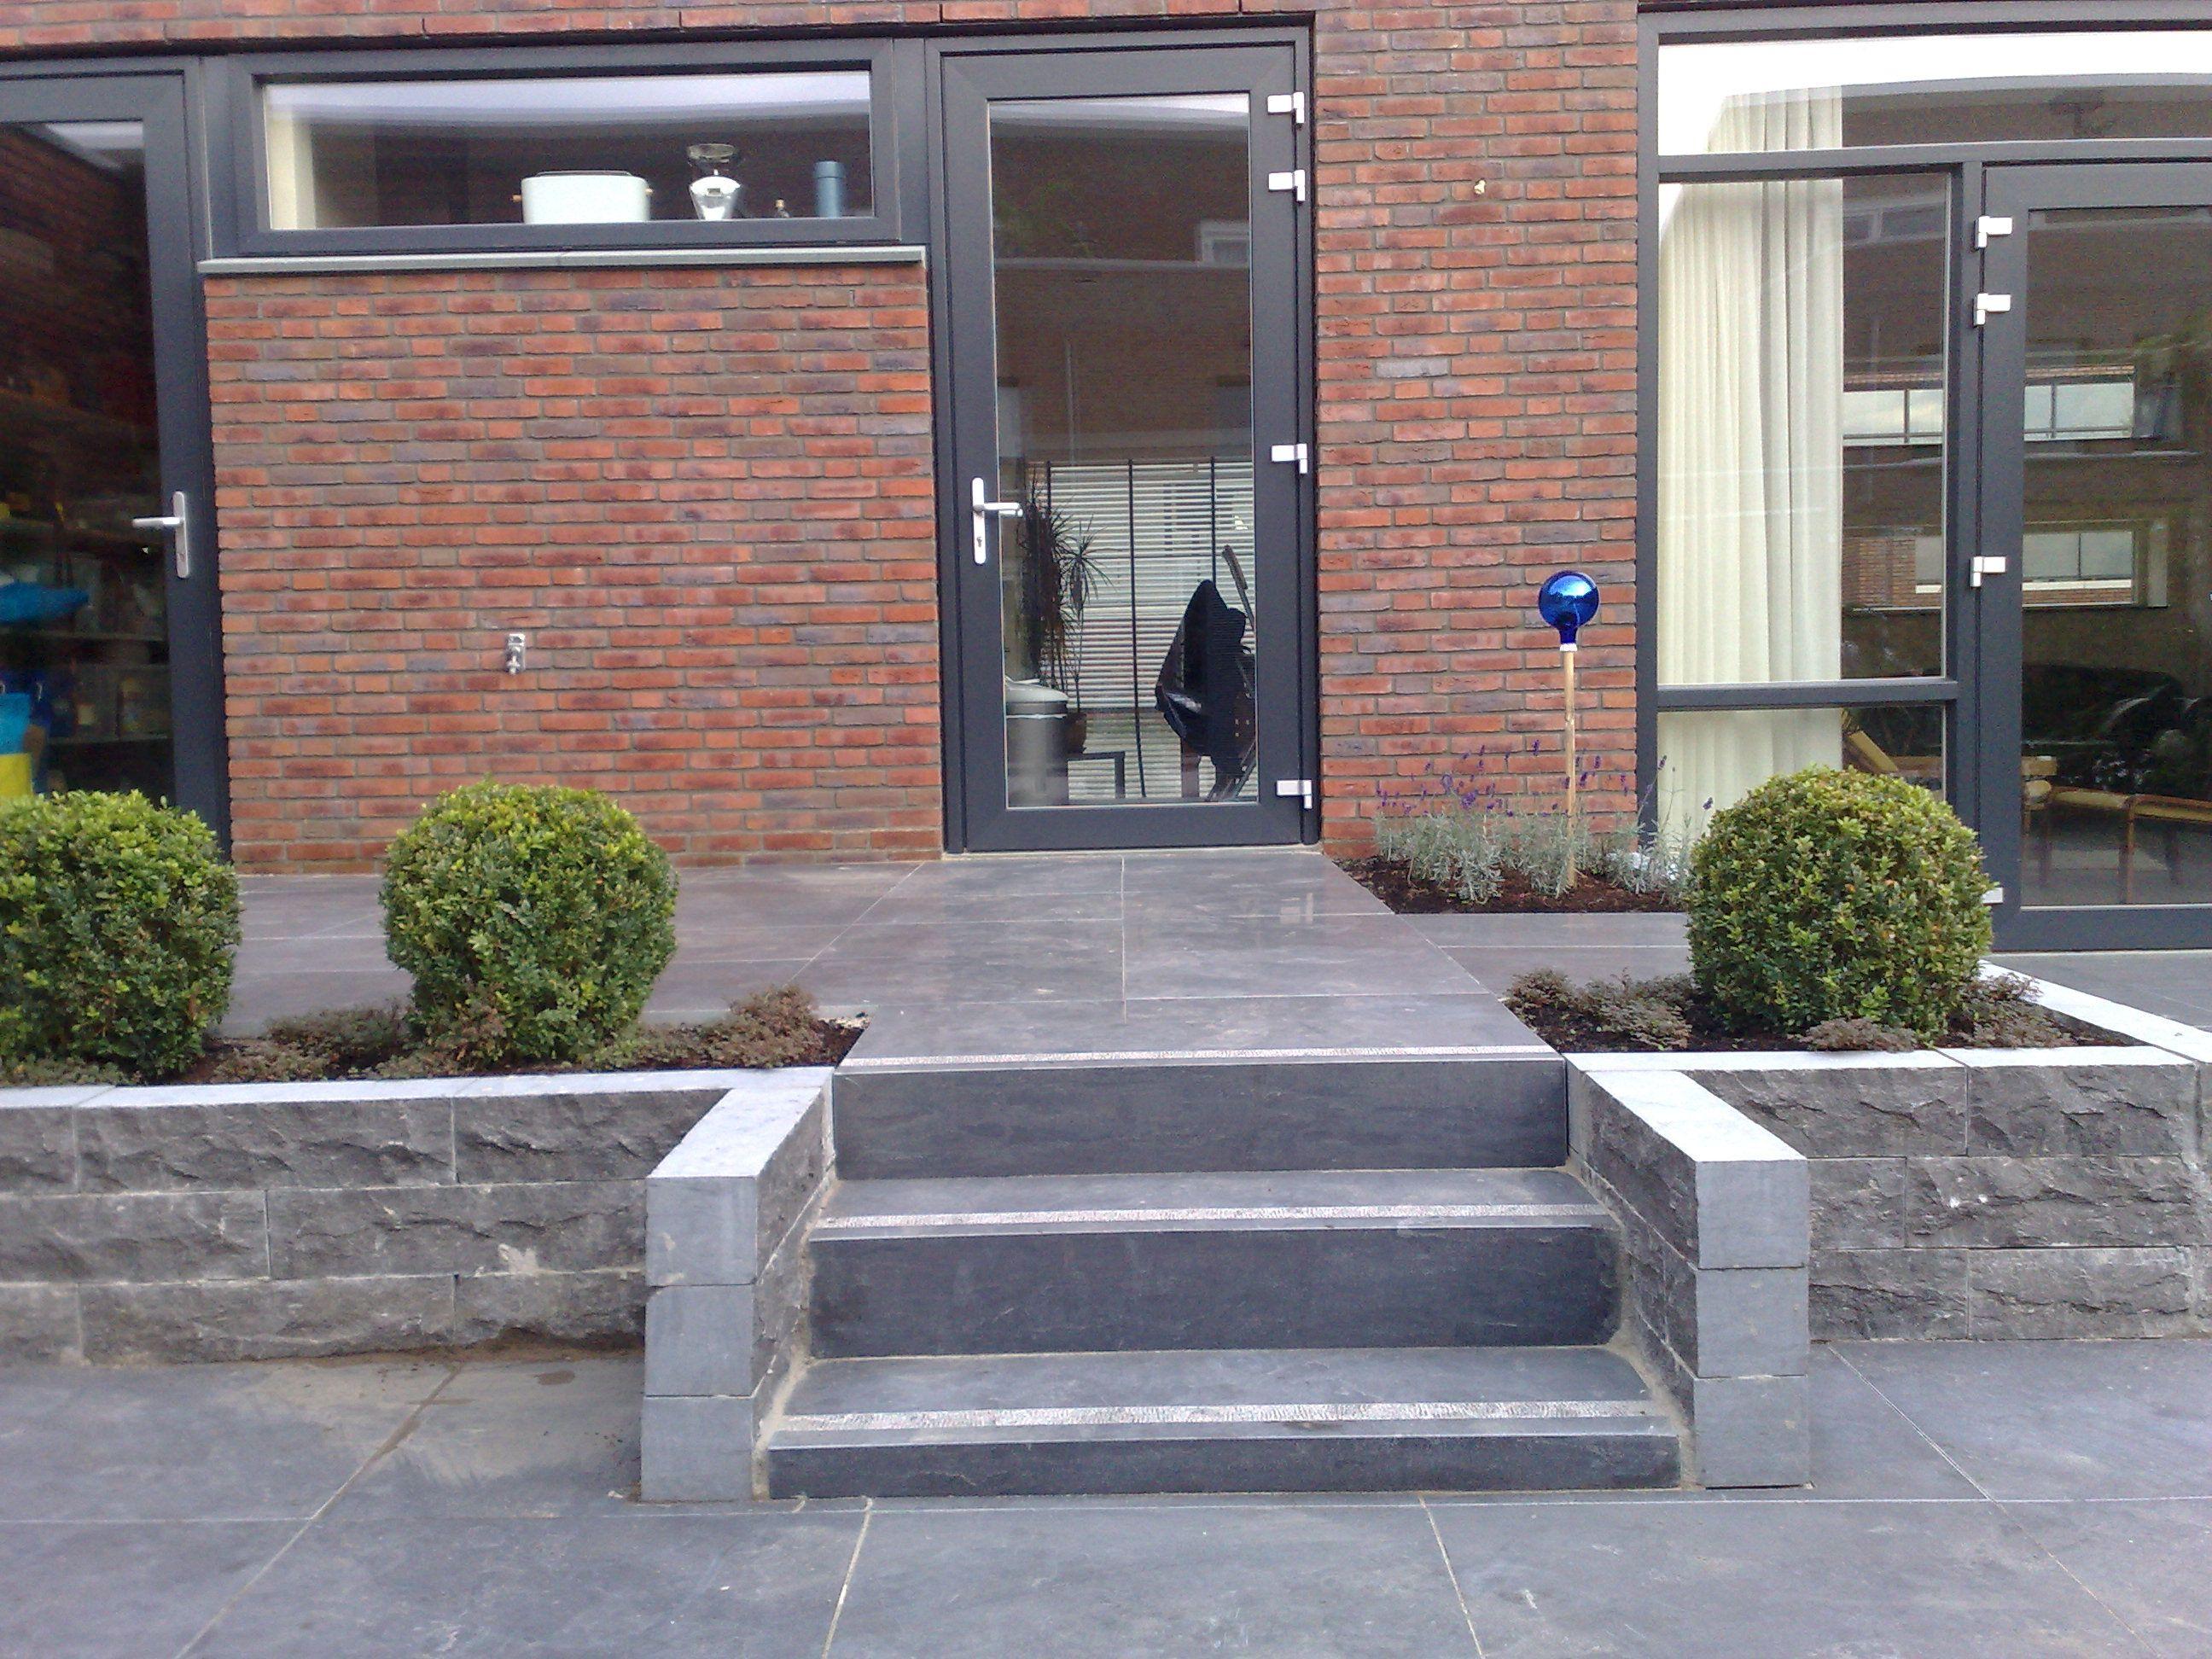 Verhoogd terras tegen huis hoe eraan beginnen bouwinfo buiten pinterest terras tuin for Terras modern huis